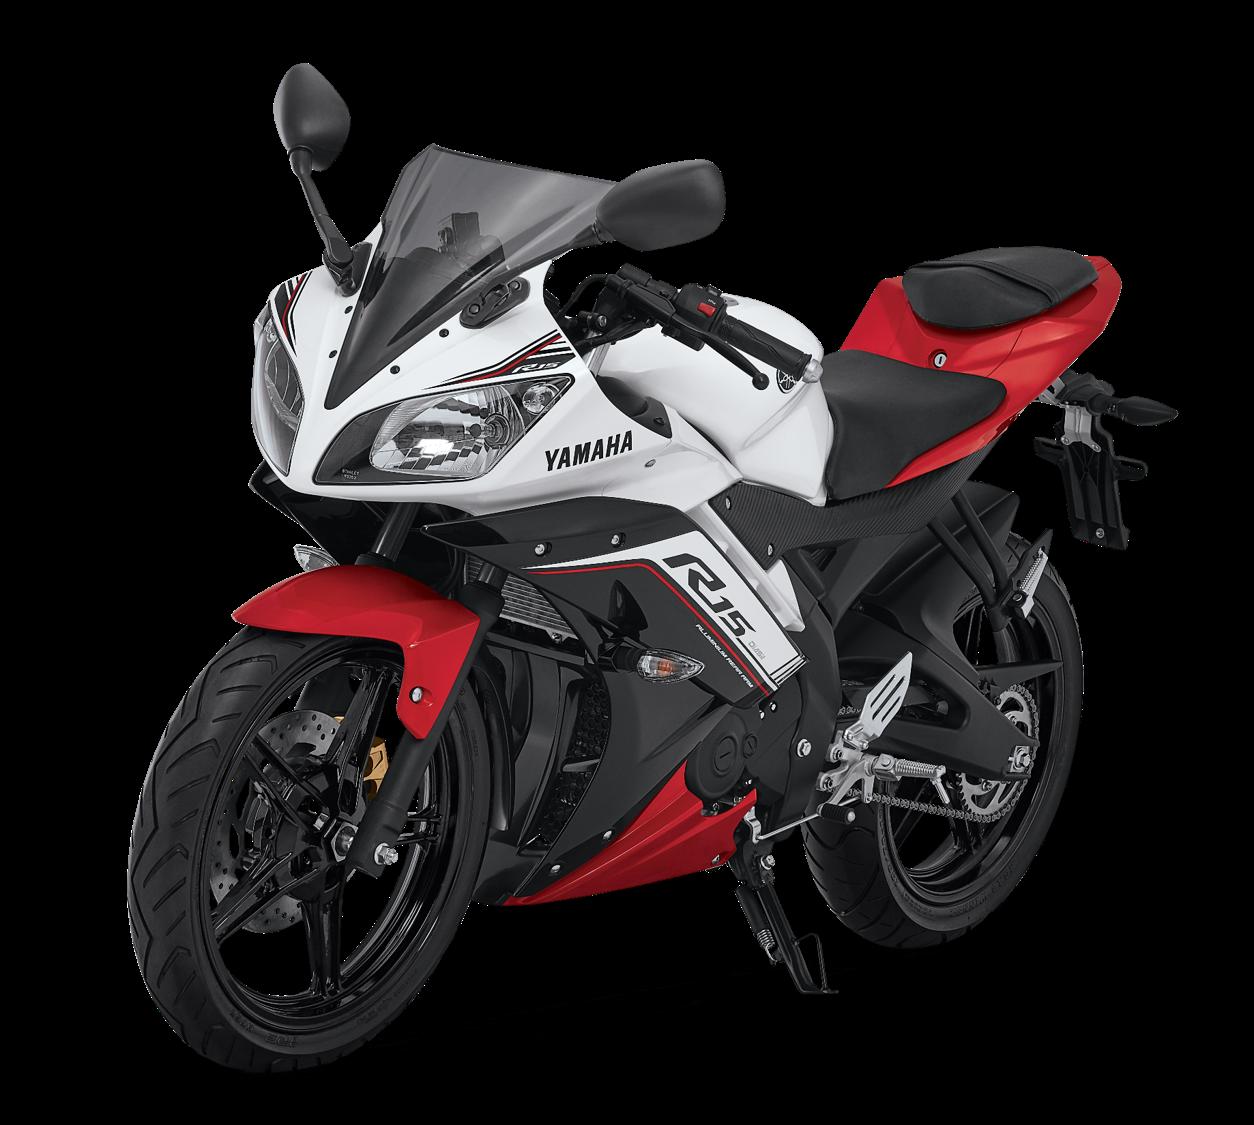 Yamaha Rilis YZF-R15 Terbaru 2016 Harga Rp. 29,8jutaan dan R15 SE Ohlins Rp. 32,8juta ...